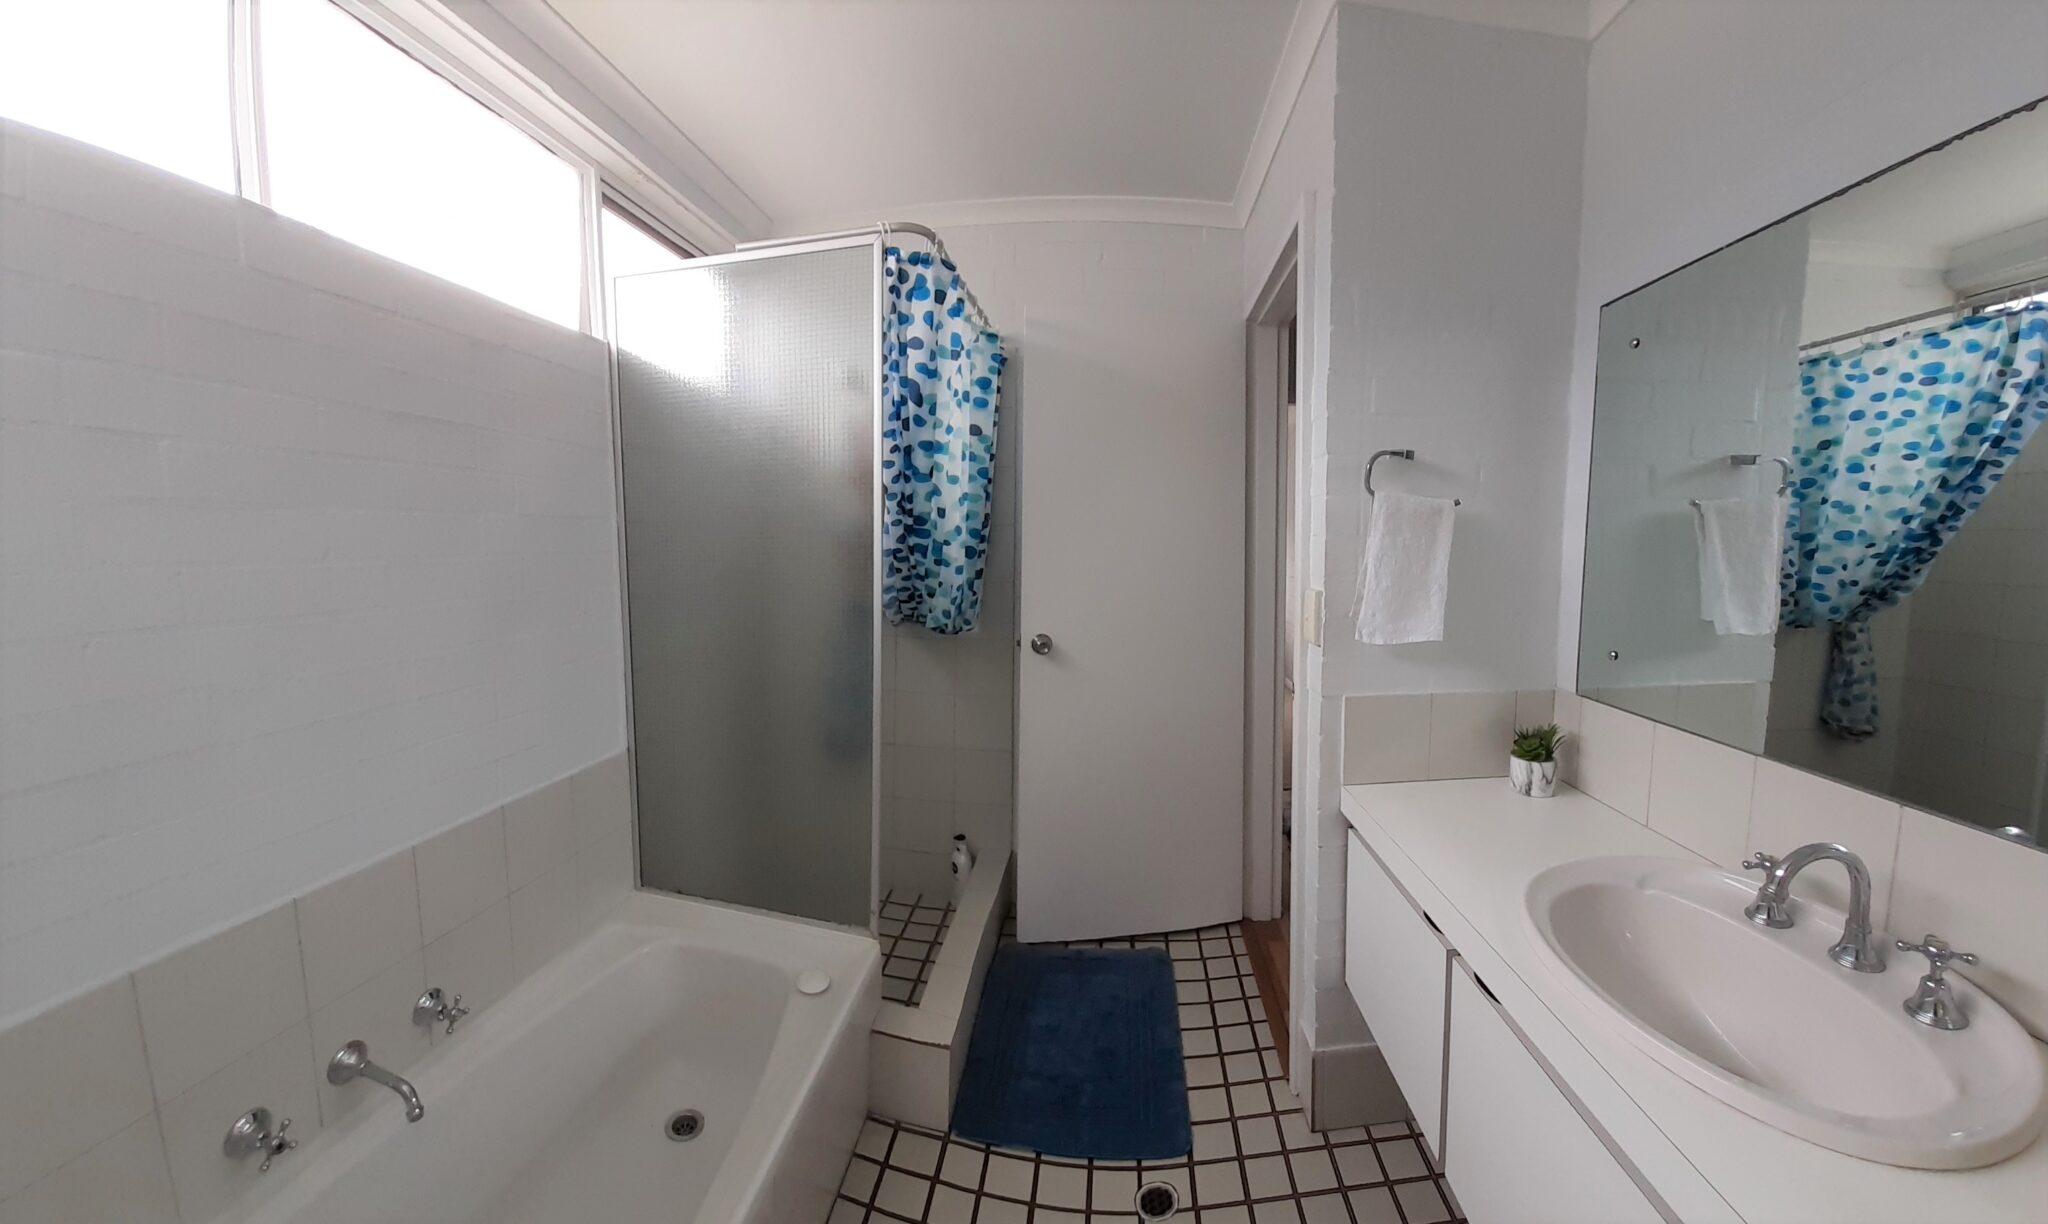 Bathroom in the Suffolk street Villa